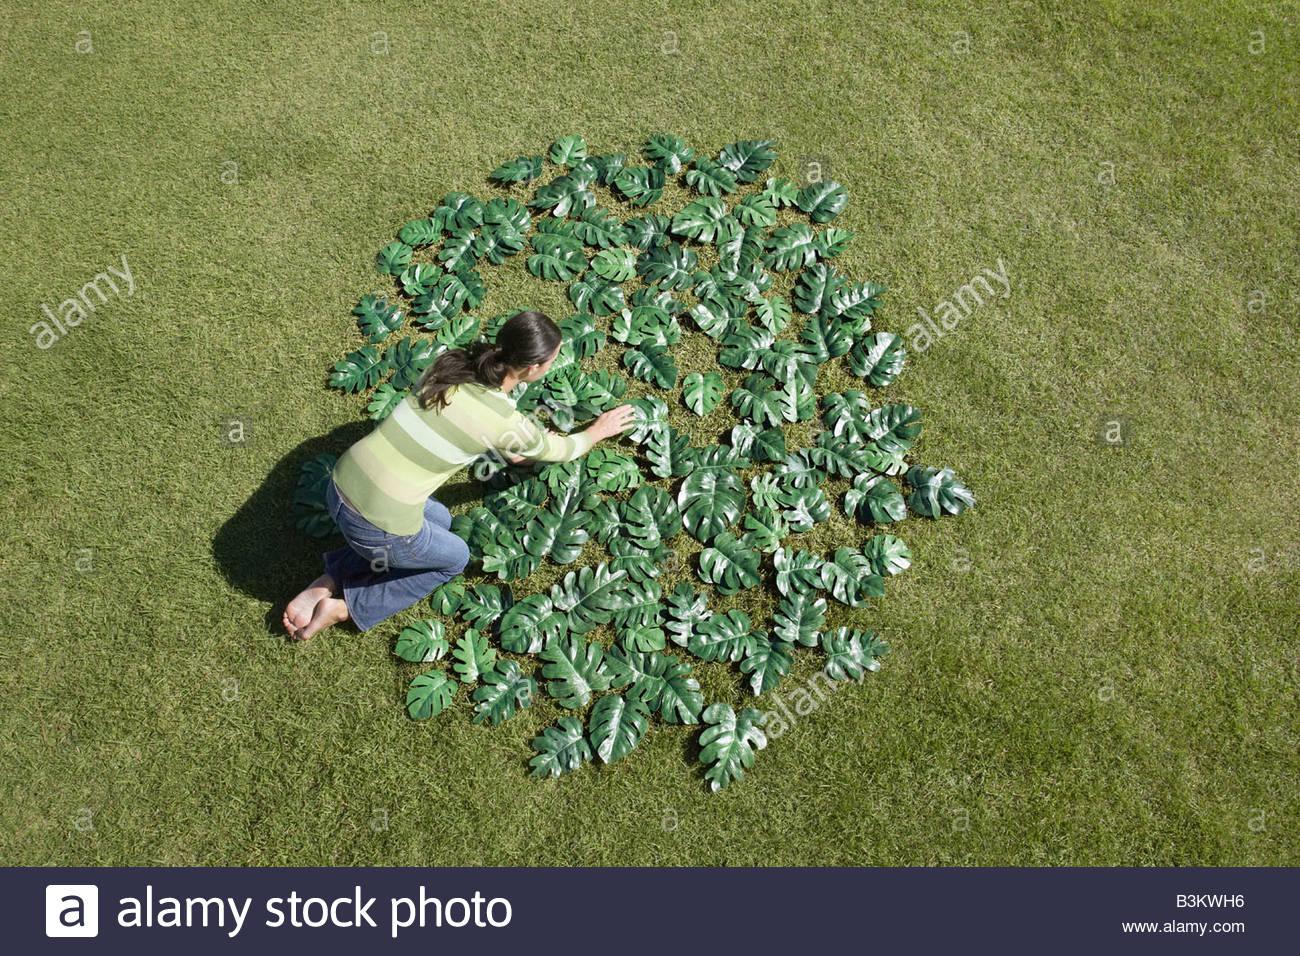 Frau grün platzieren lässt im Kreis Stockbild